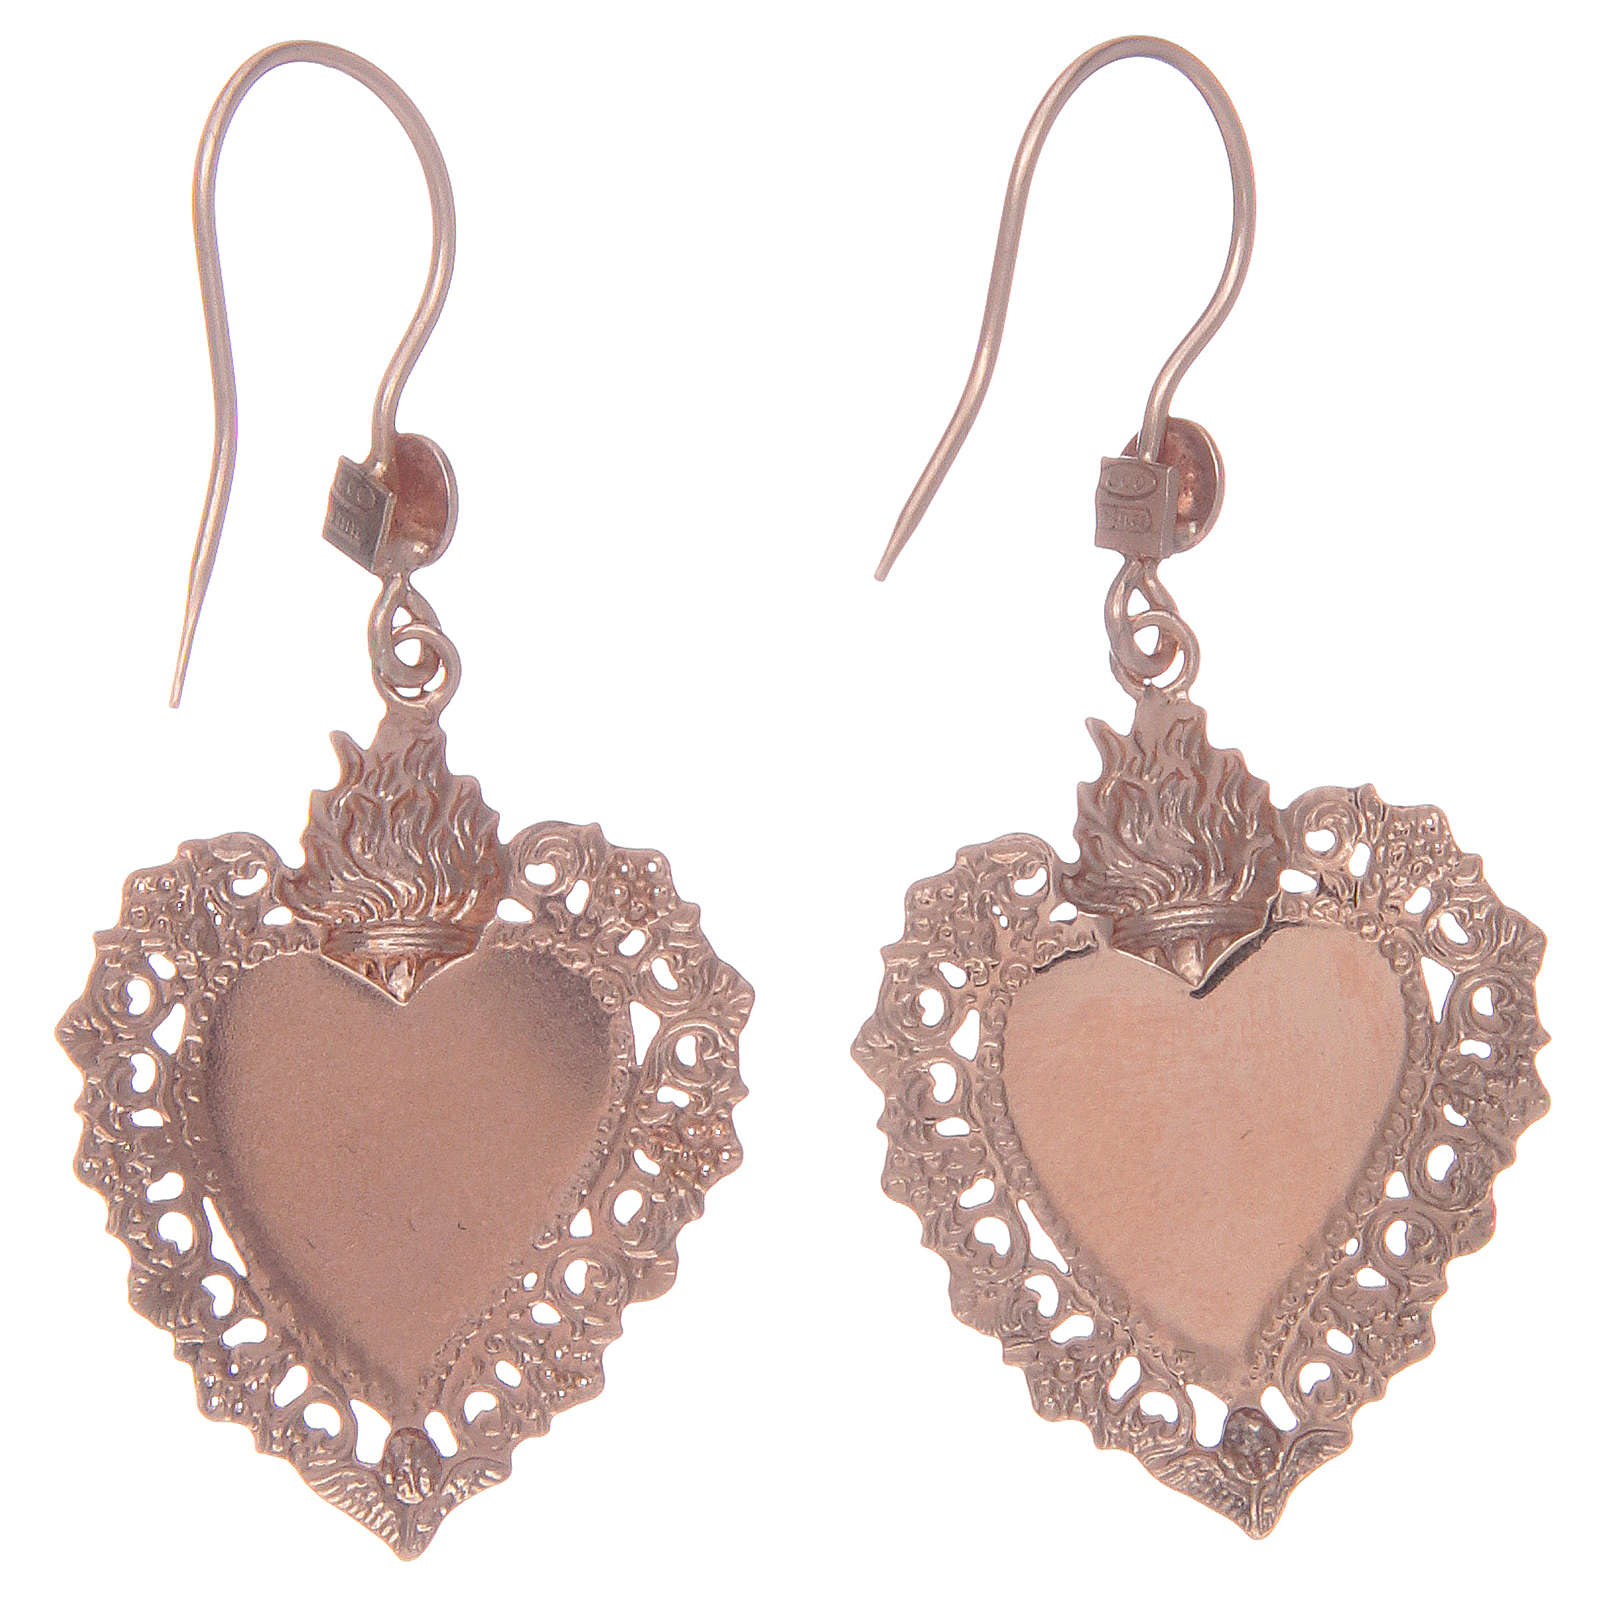 925 sterling silver pendant earrings with votive heart rosè 4